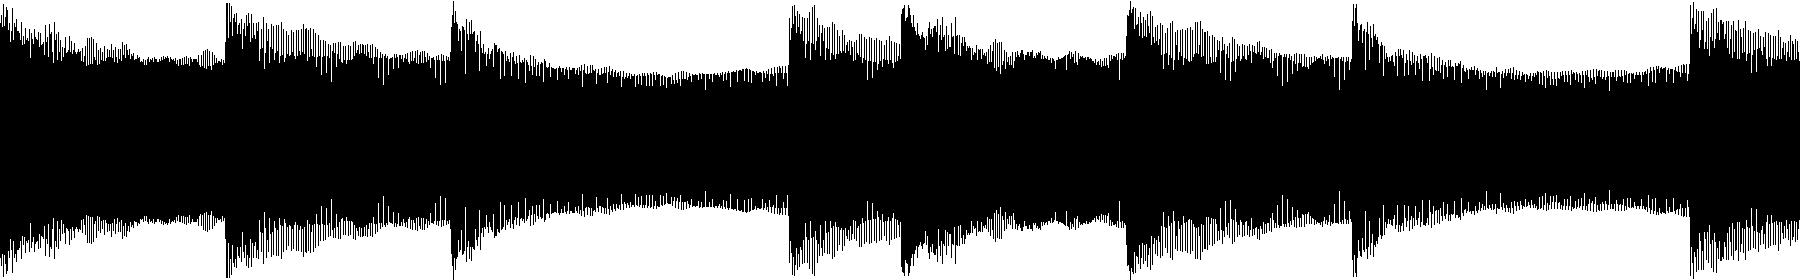 vedh melodyloop 107 gm f e f 122bpm